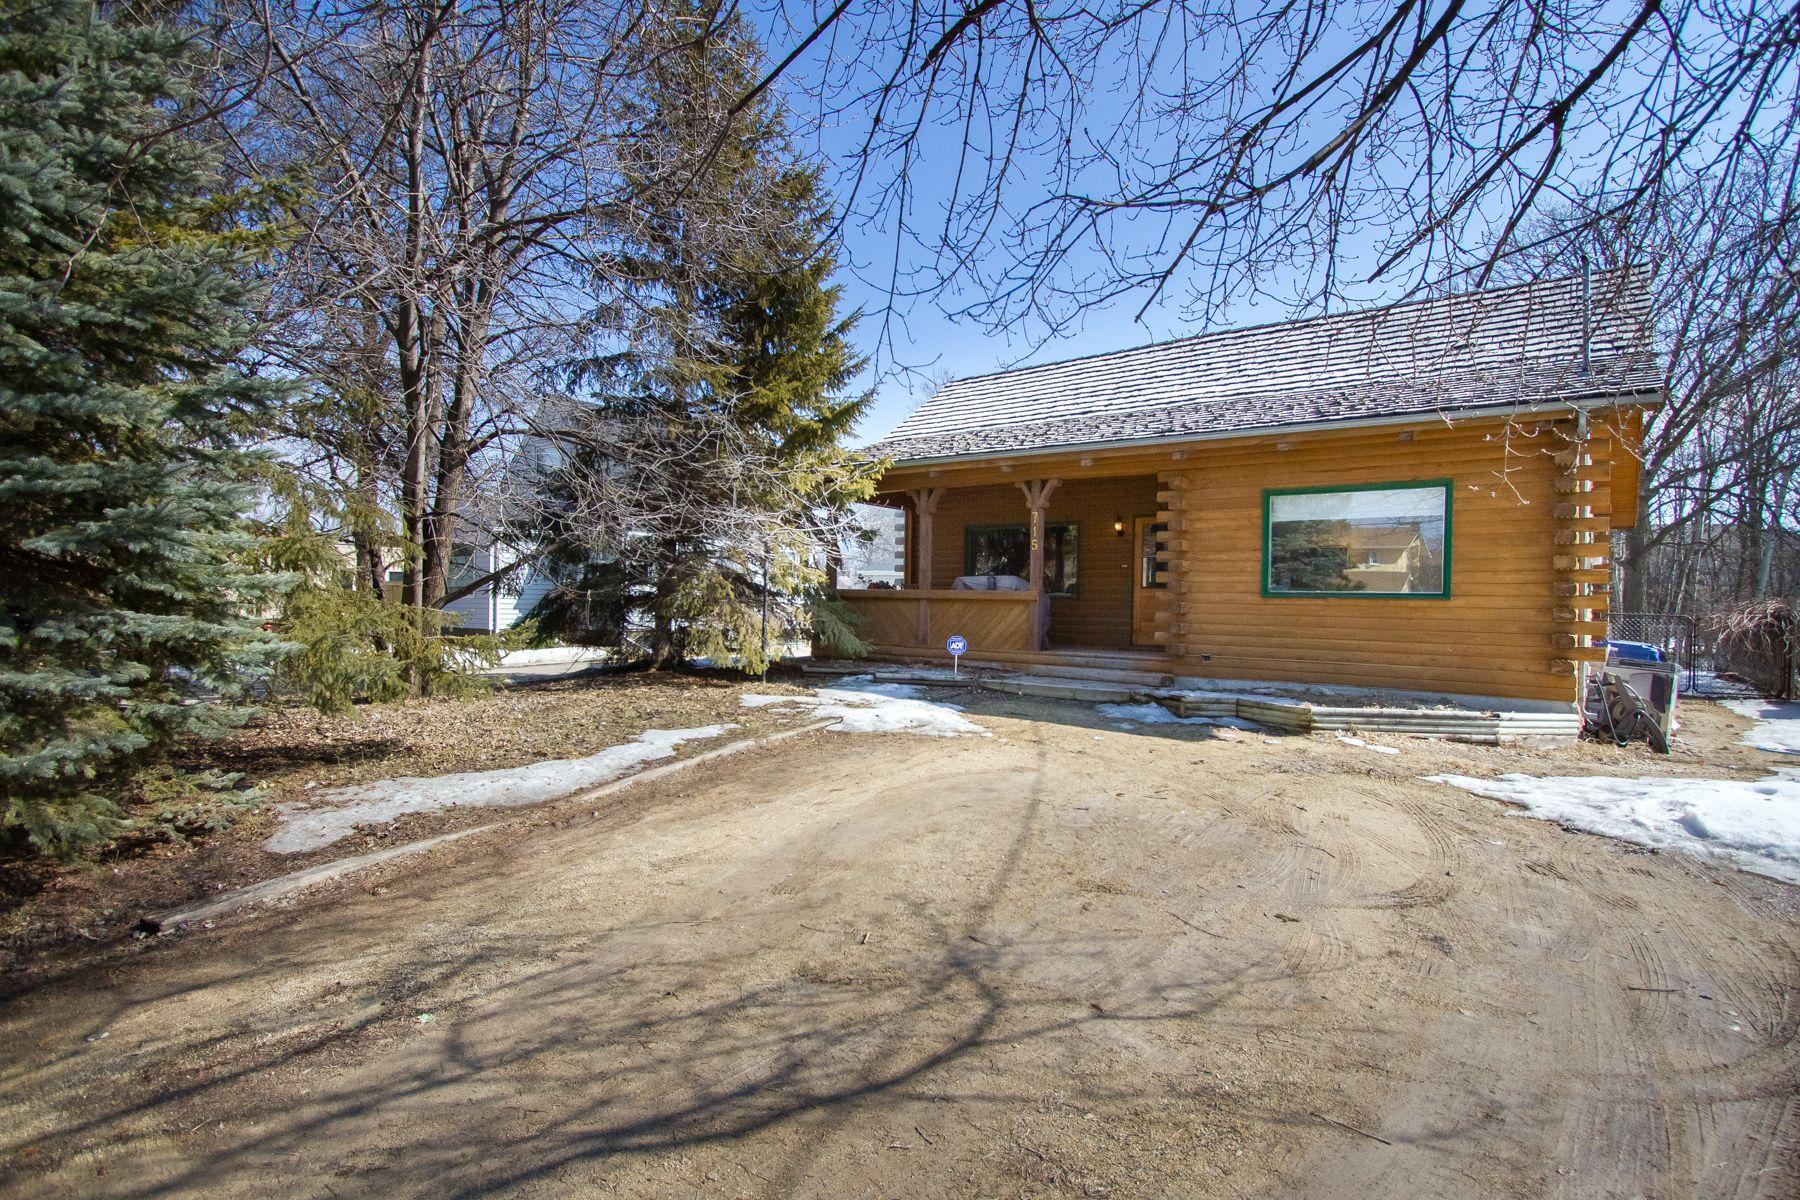 Main Photo: 715 Haney Street in Winnipeg: Charleswood House for sale (1G)  : MLS®# 1706771